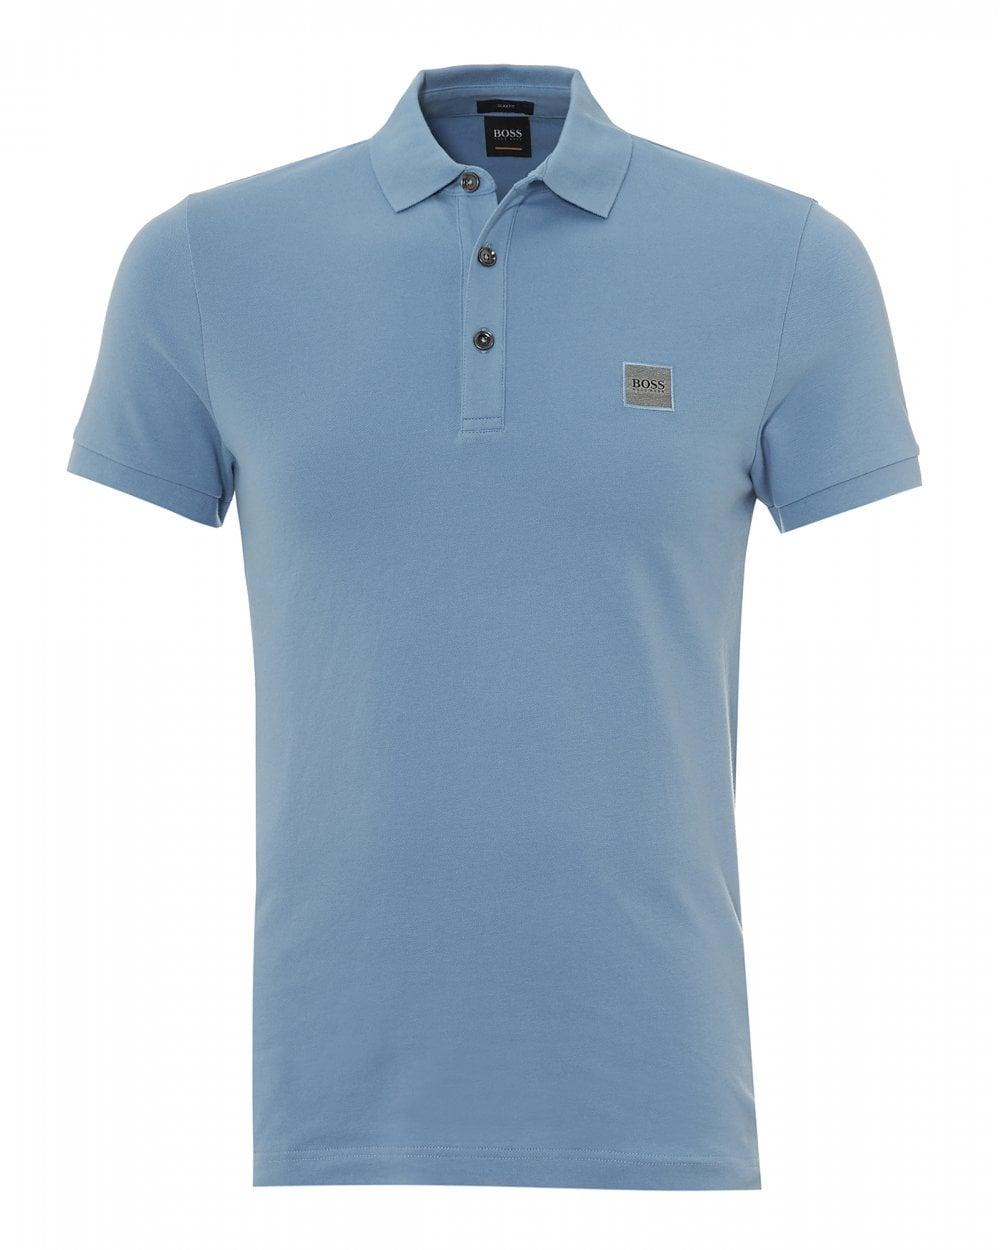 dce29ac15c BOSS Casual Mens Passenger Polo, Slim Fit Sky Blue Polo Shirt